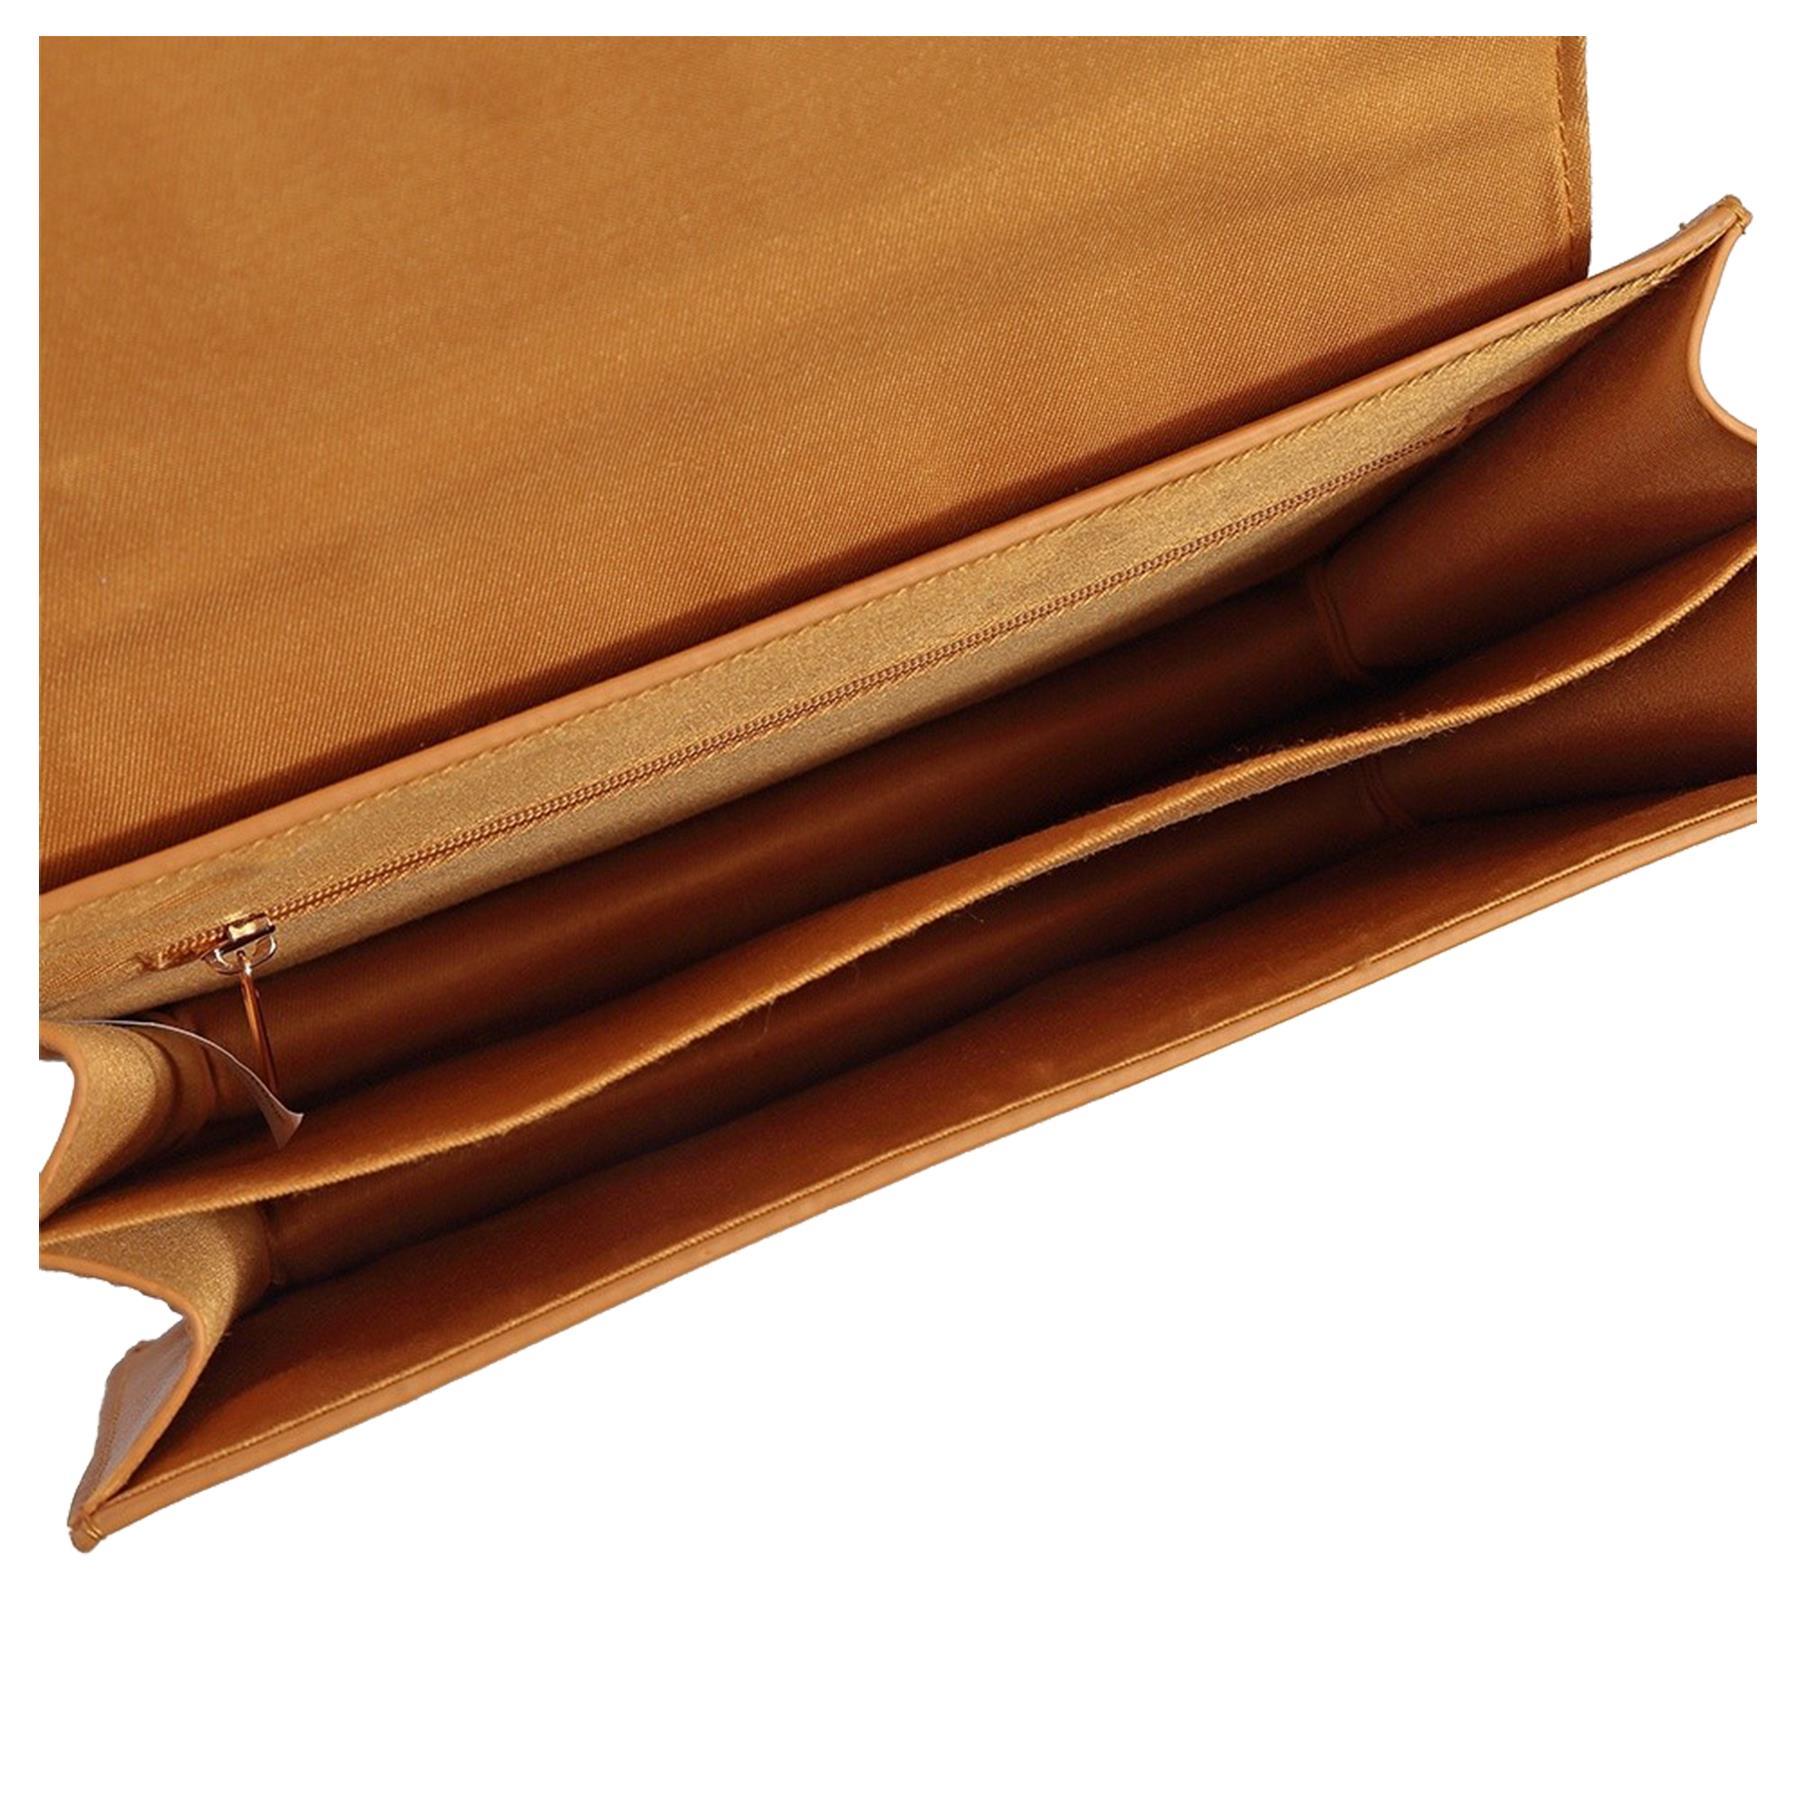 New-Women-s-Faux-Leather-Elegant-Stylish-Fashion-Shoulder-Clutch-Bag thumbnail 10